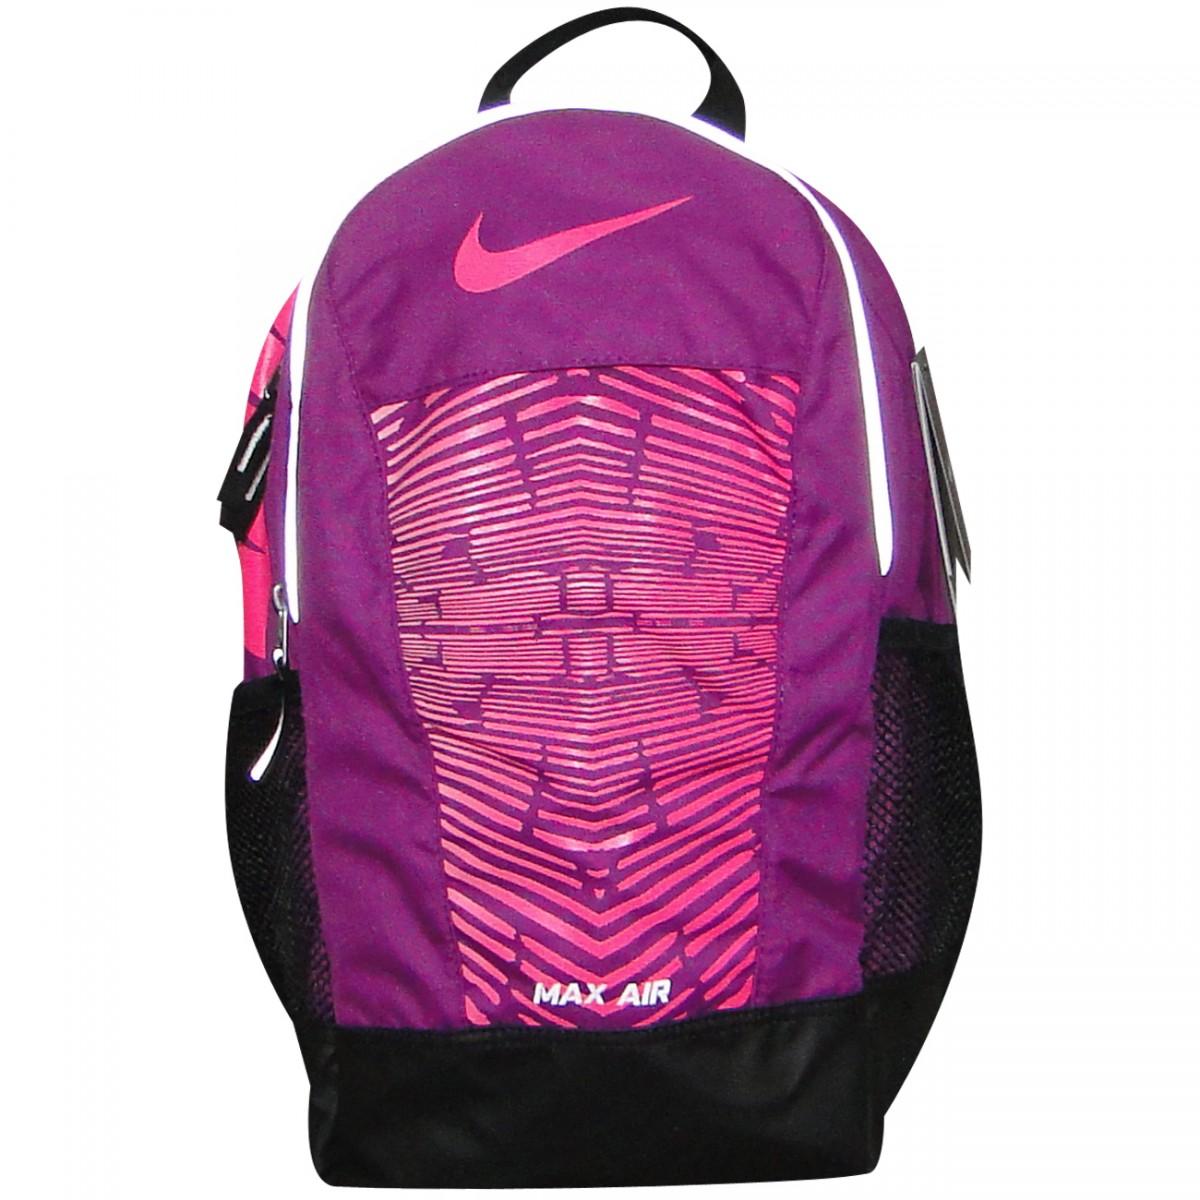 mochila da adidas feminina rosa